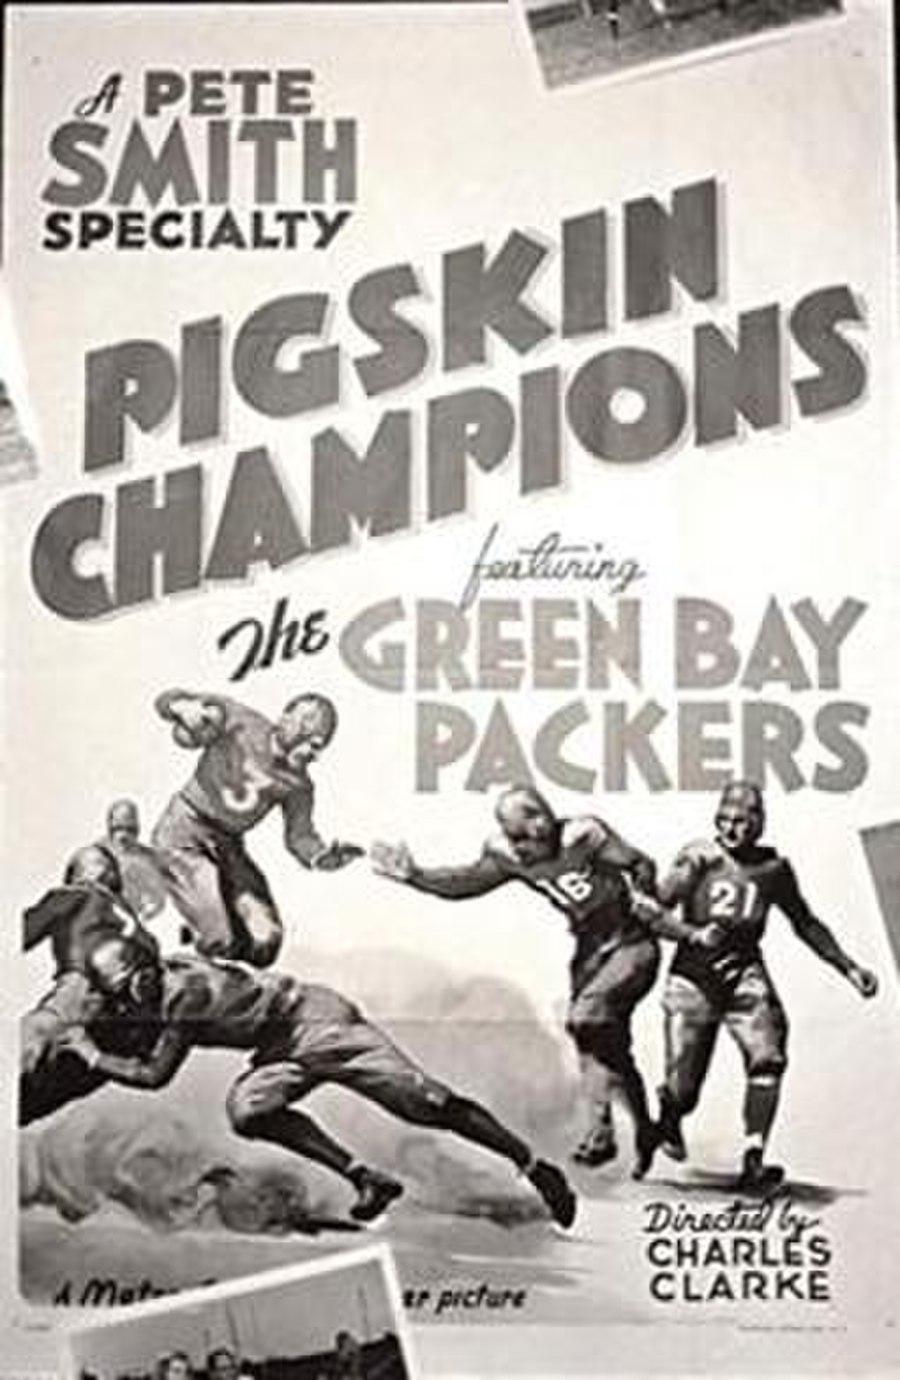 Pigskin Champions